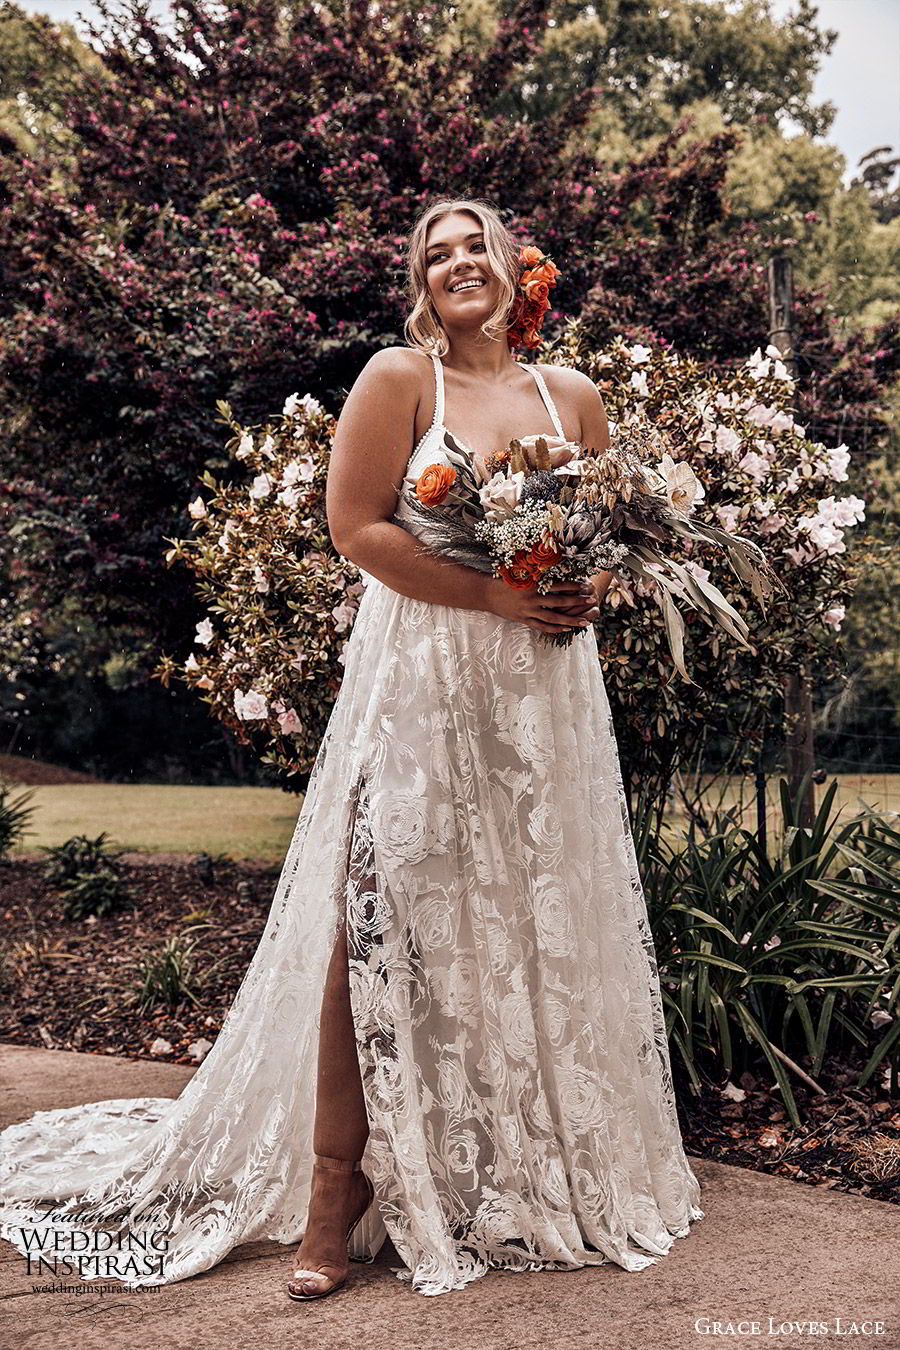 grace loves lace 2019 bridal sleeveless straps sweetheart neckline fully embellished lace a line ball gown wedding dress slit skirt chapel train plus size elegant romantic (2) mv